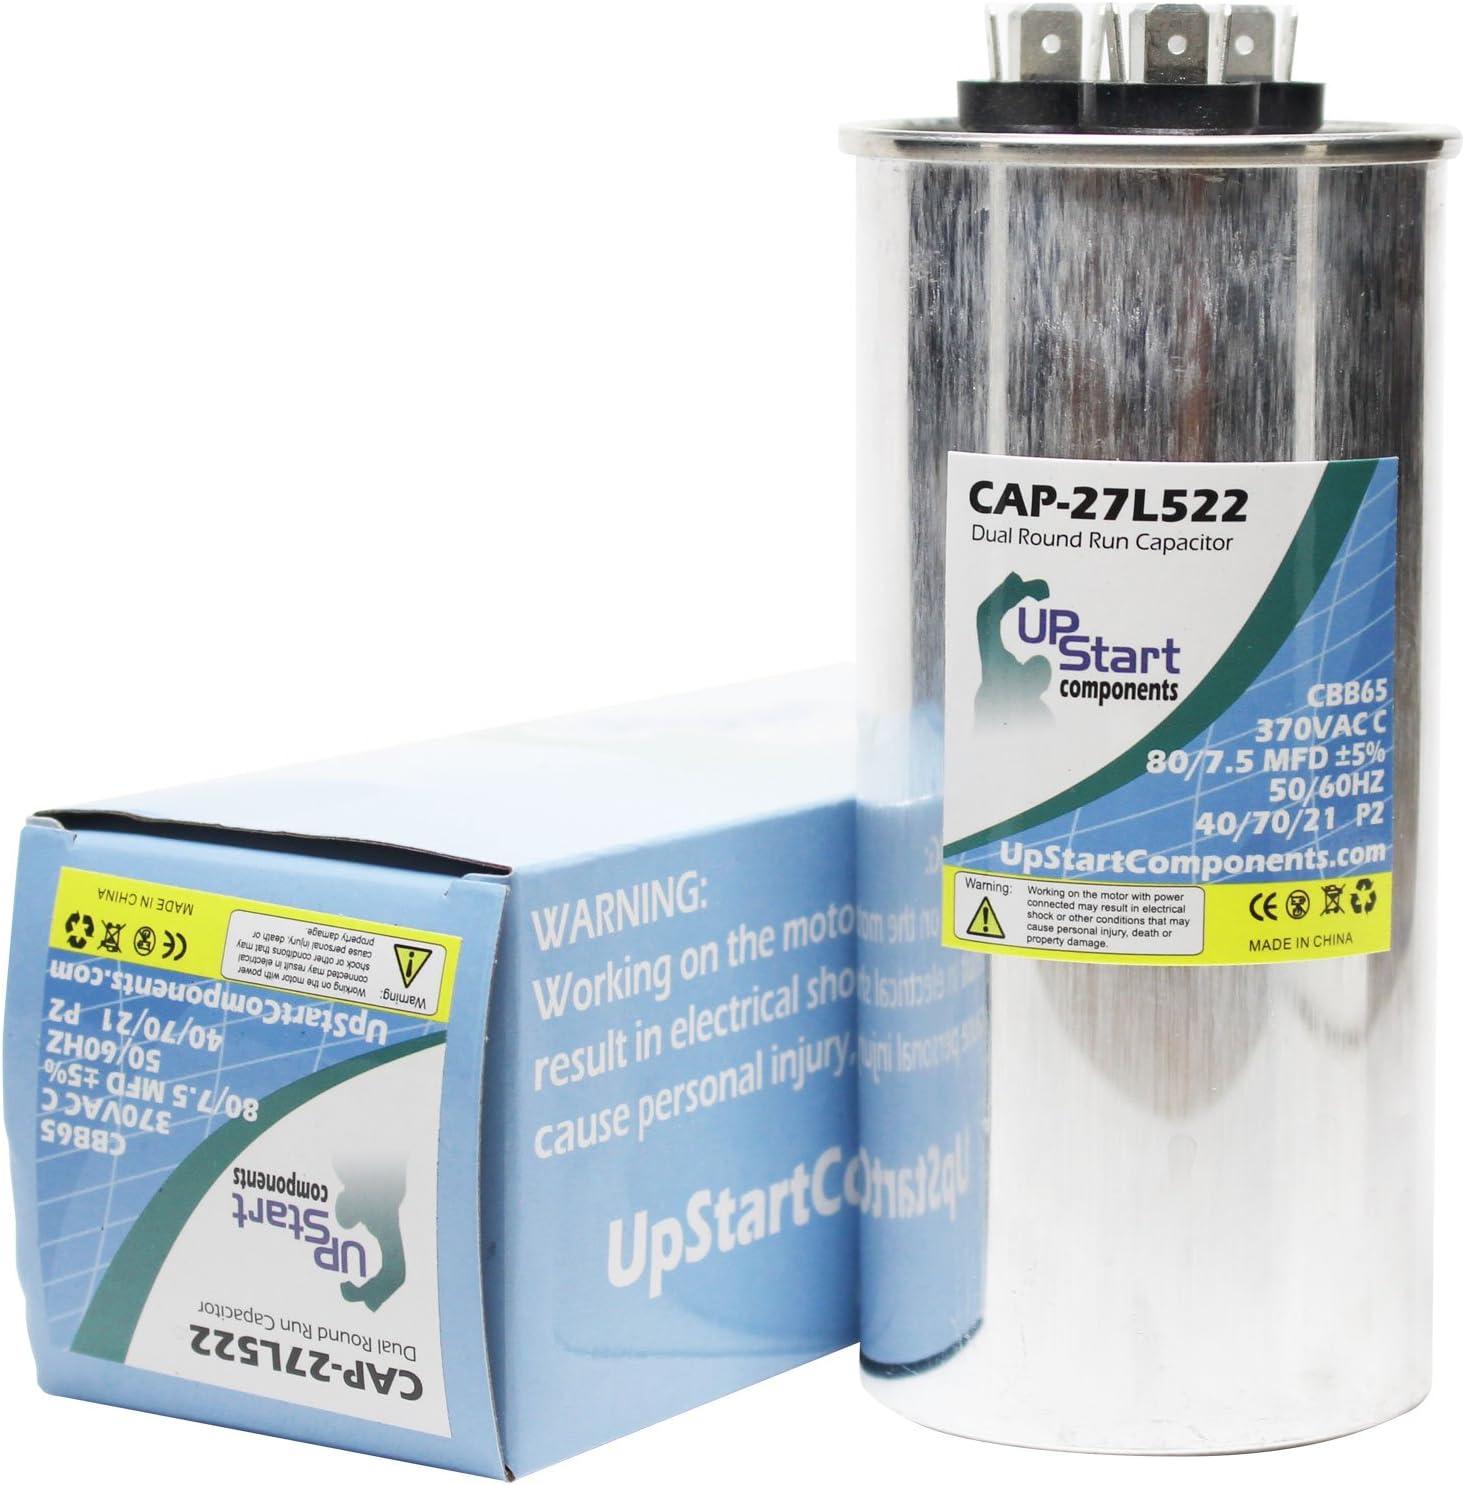 Replacement 80/7.5 MFD 370 Volt Round Dual Run Capacitor - Compatible With GE 27L522, Frymaster SE807, ICP 1066474, ICP 1086650, ICP 1149999, ICP 1172296, ICP C2A360GKA100, ICP C2H360GKA100